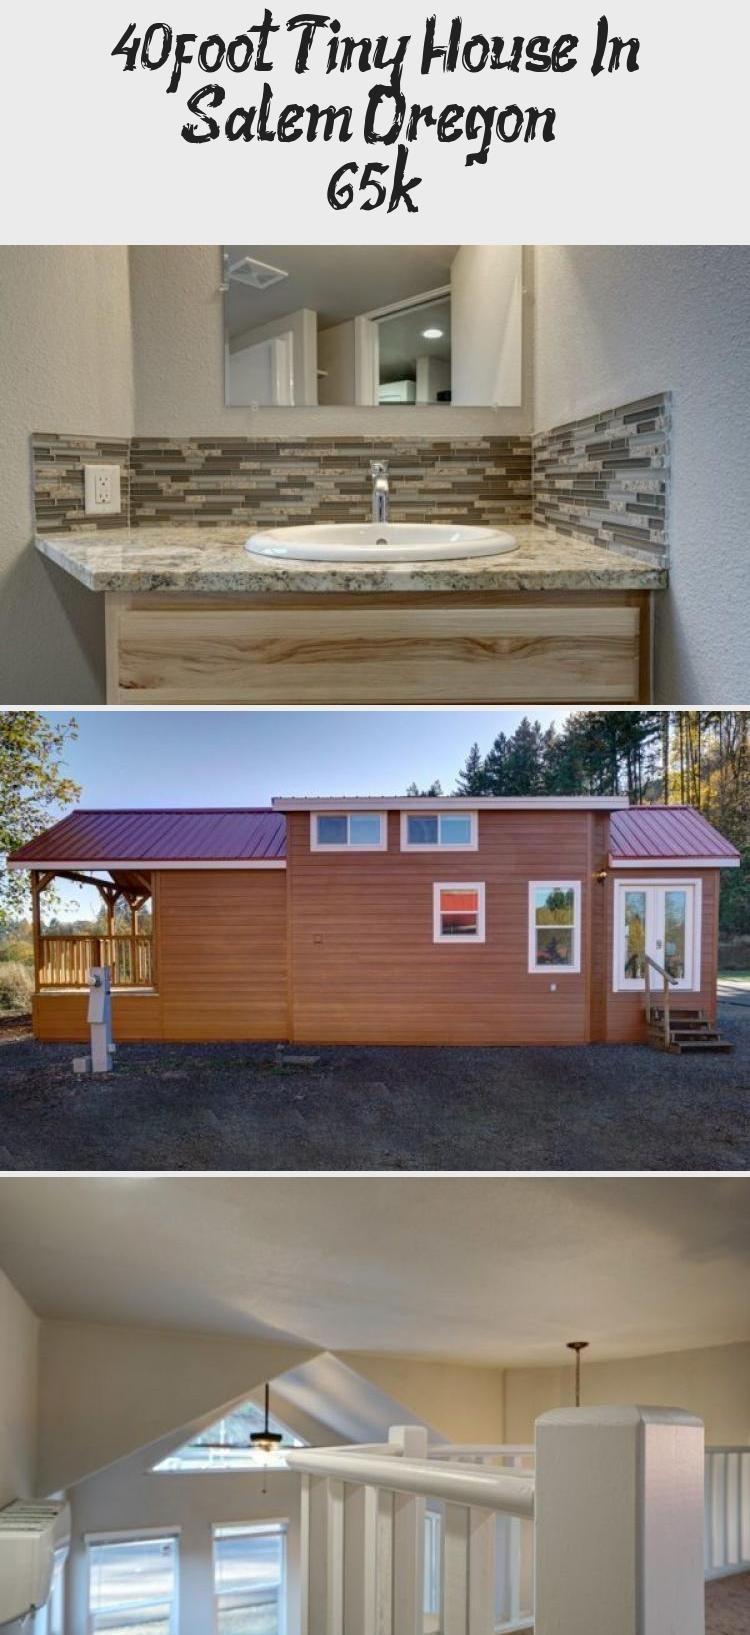 40foot tiny house in salem oregon 65k